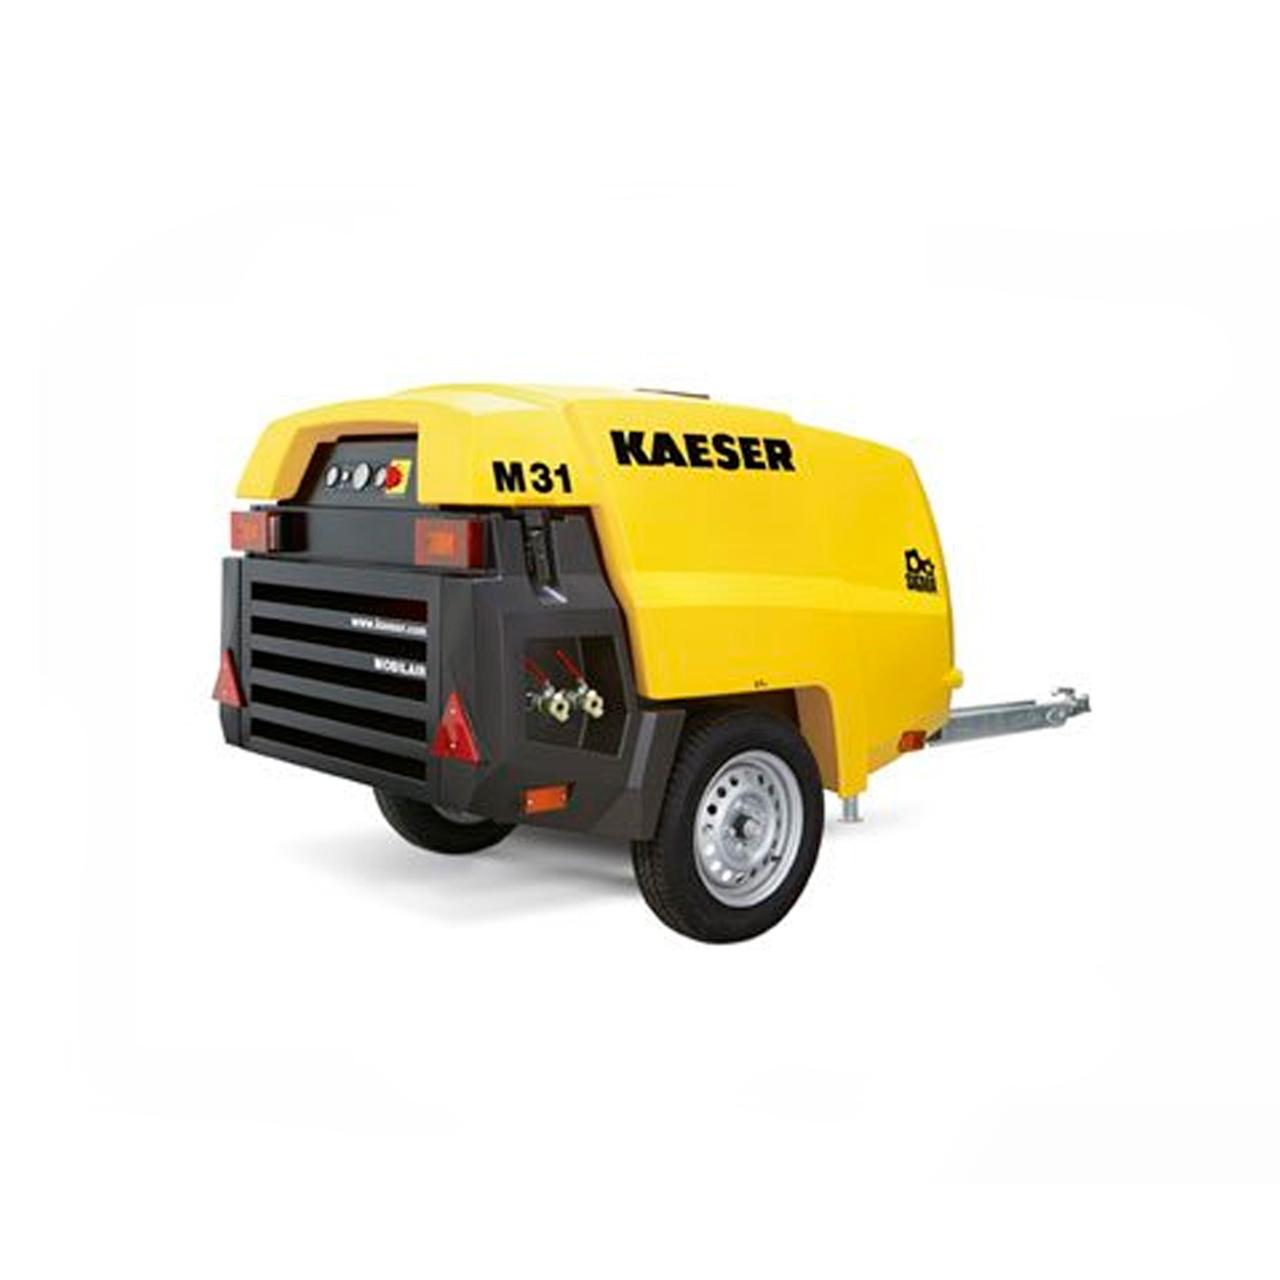 Kaeser M31 Diesel Compressor